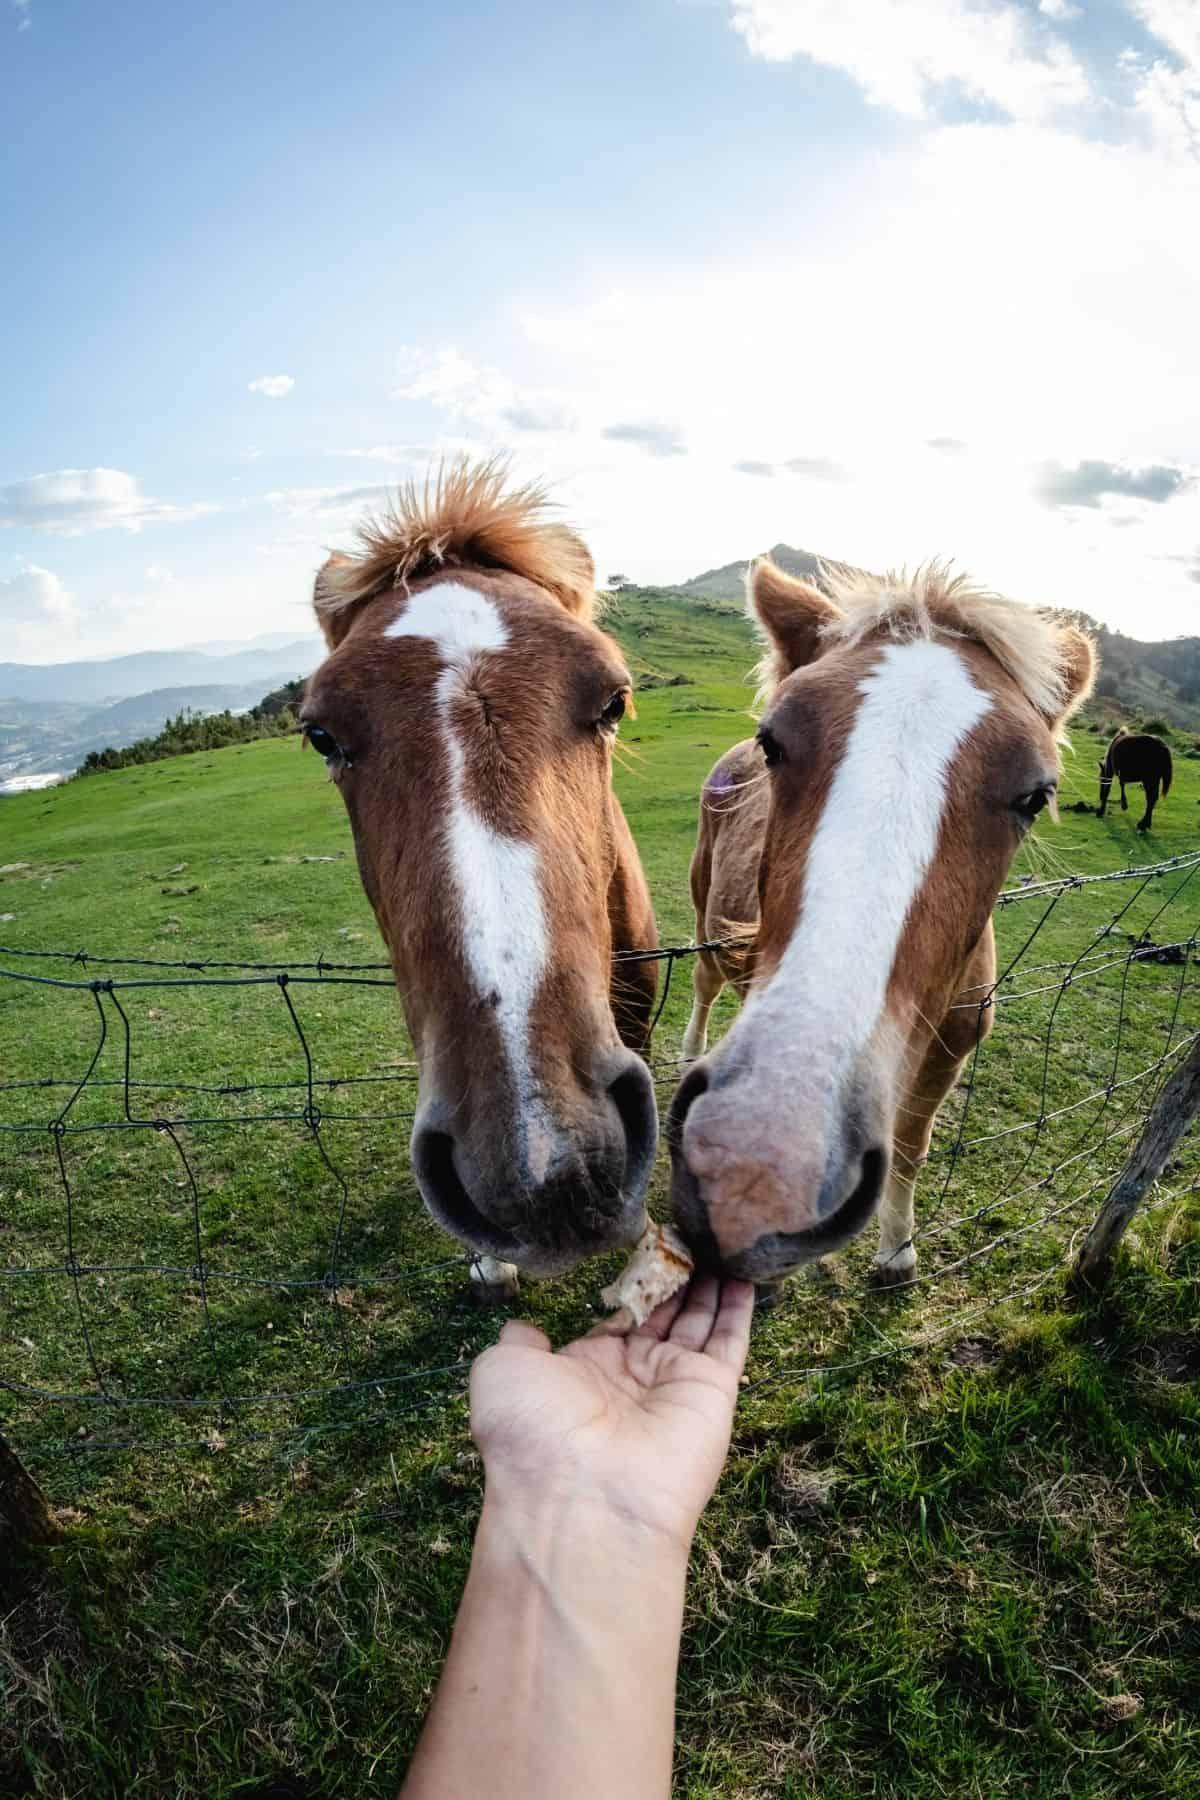 Two horses feeding